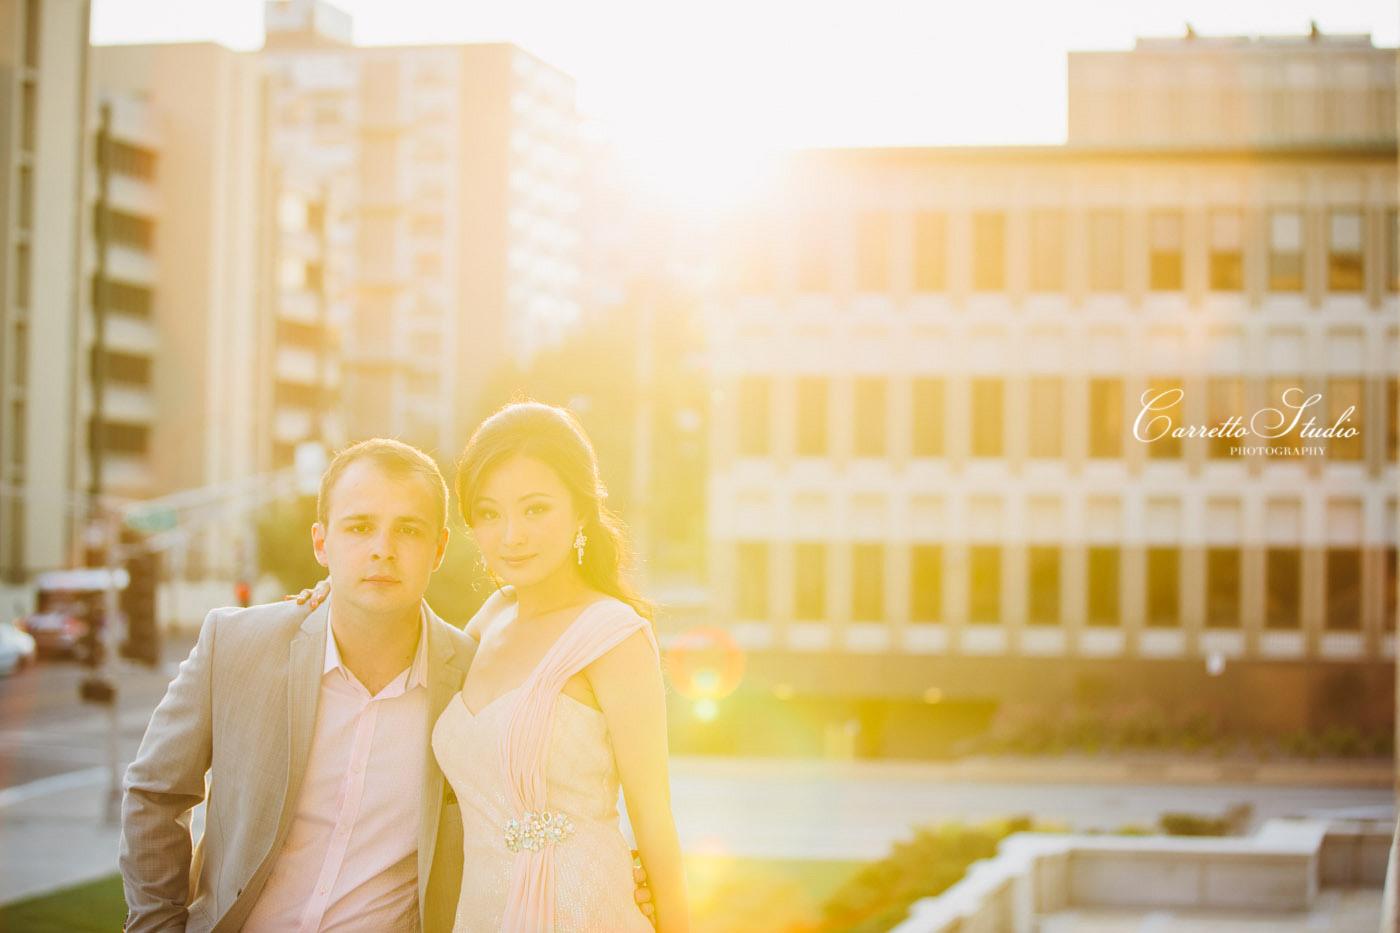 St-Louis-Wedding-Photography-10093.jpg